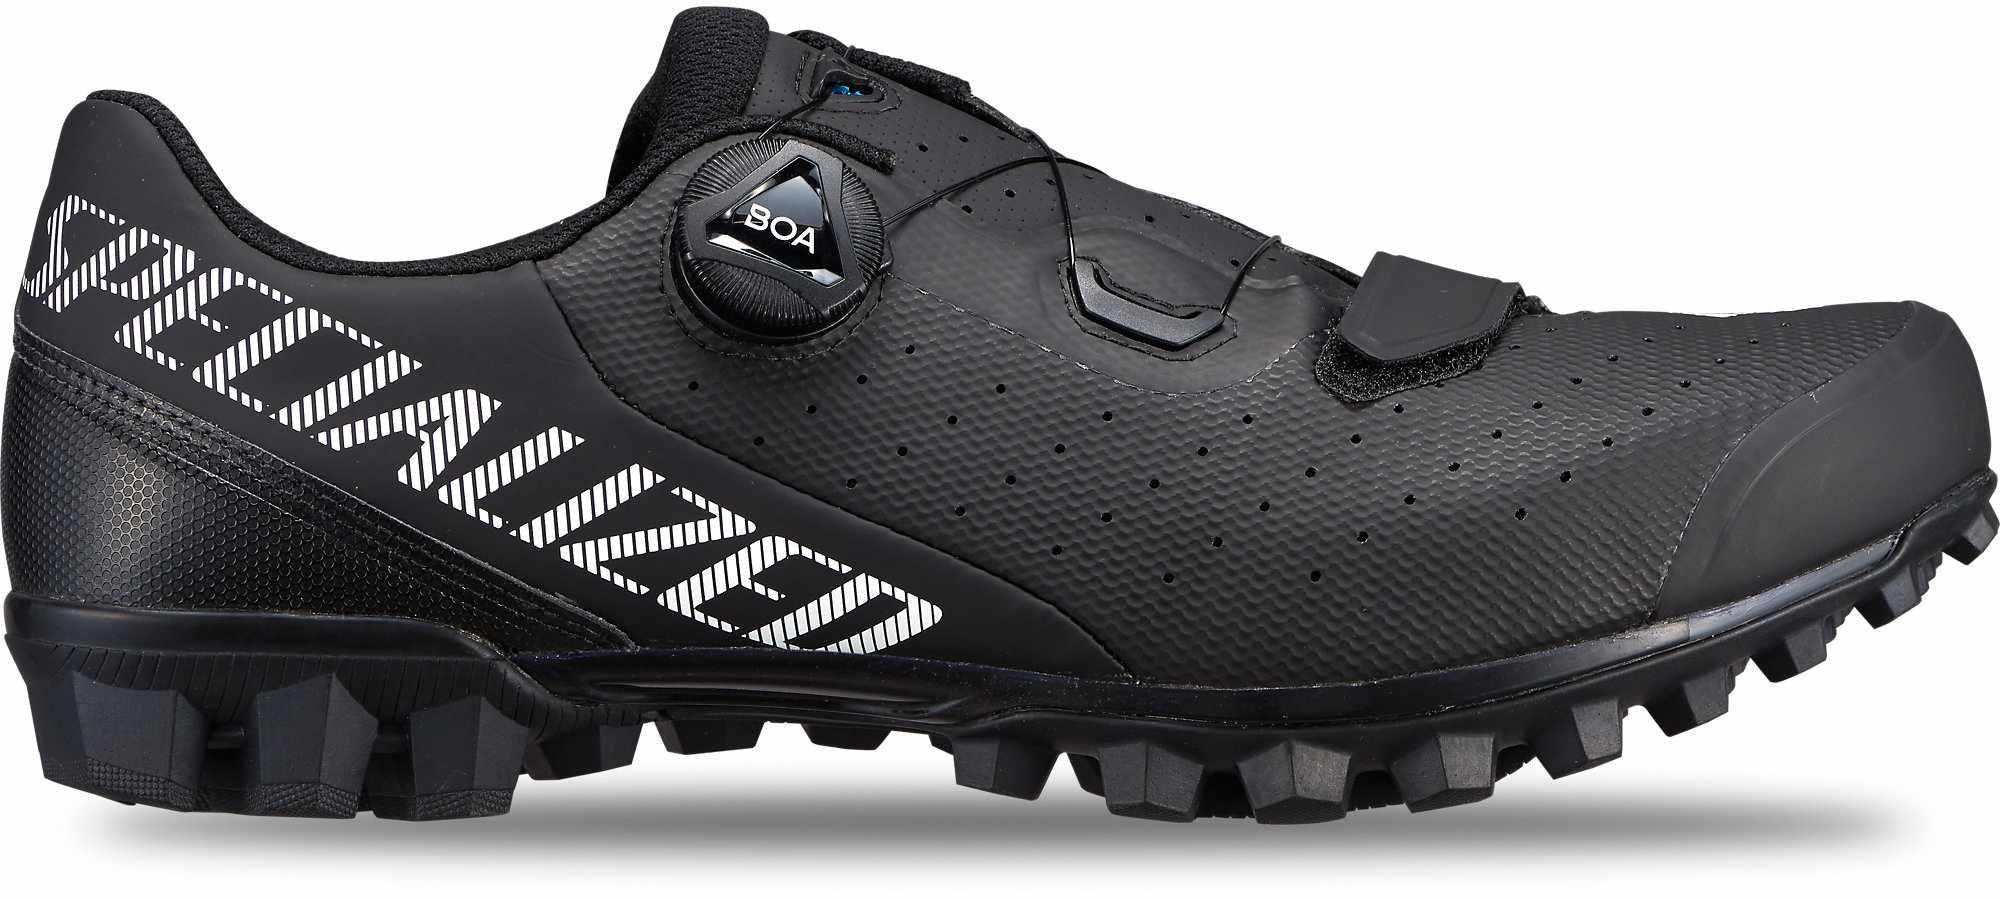 Specialized Recon 2.0 Mountain Bike Shoe